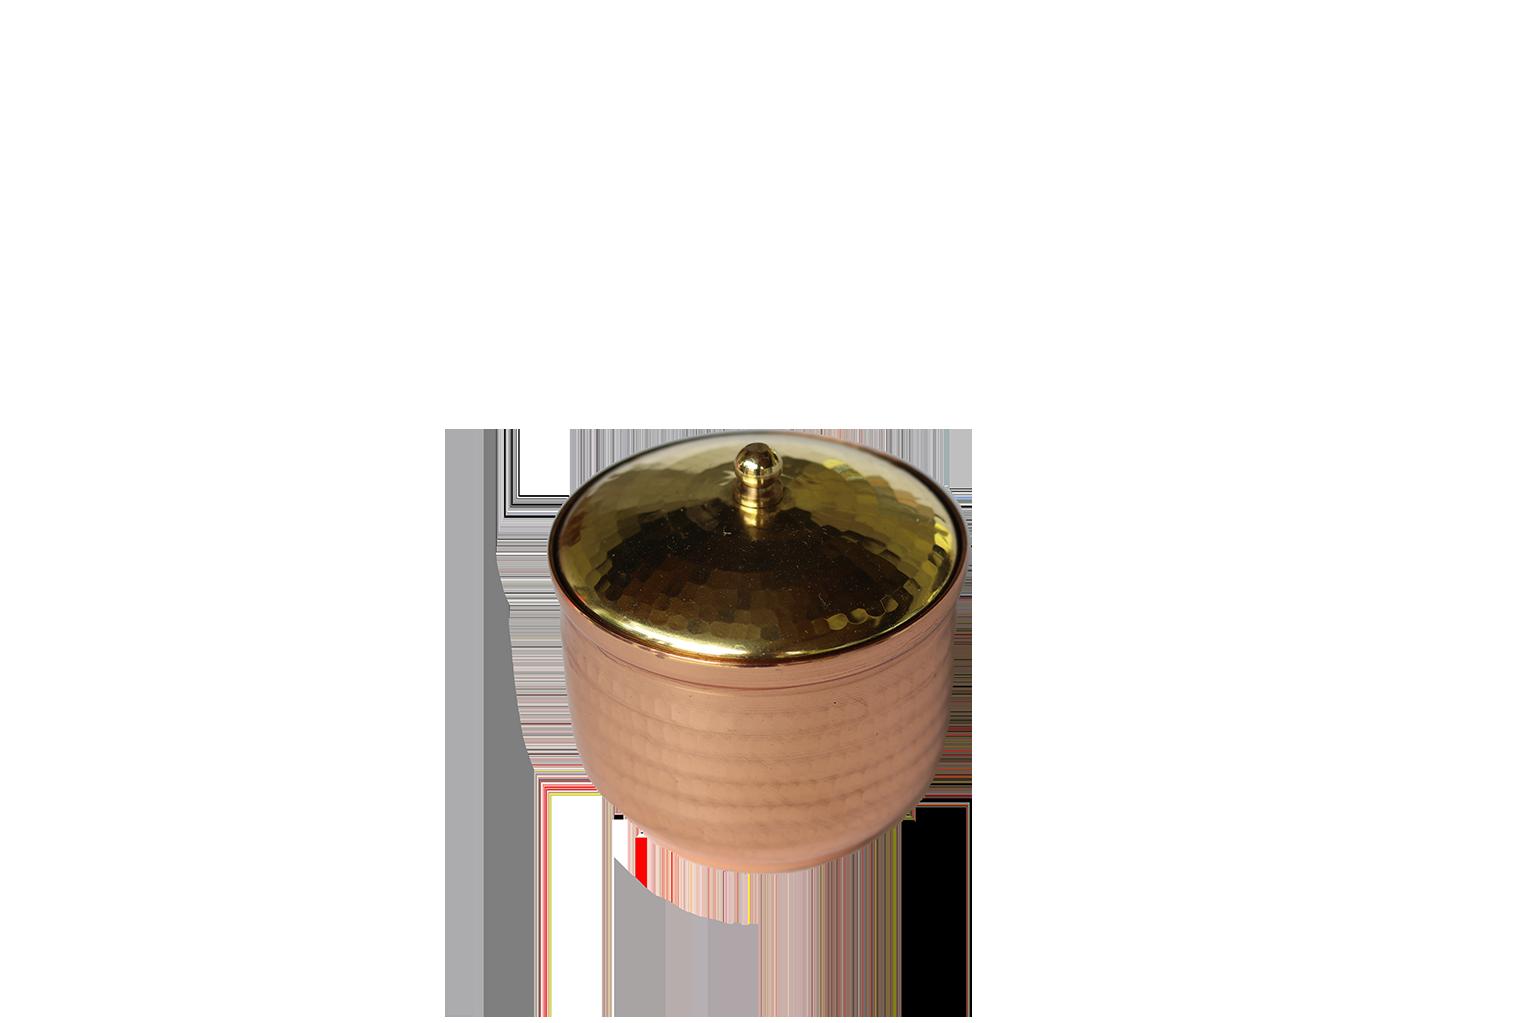 Copper Trinket Box - S$35